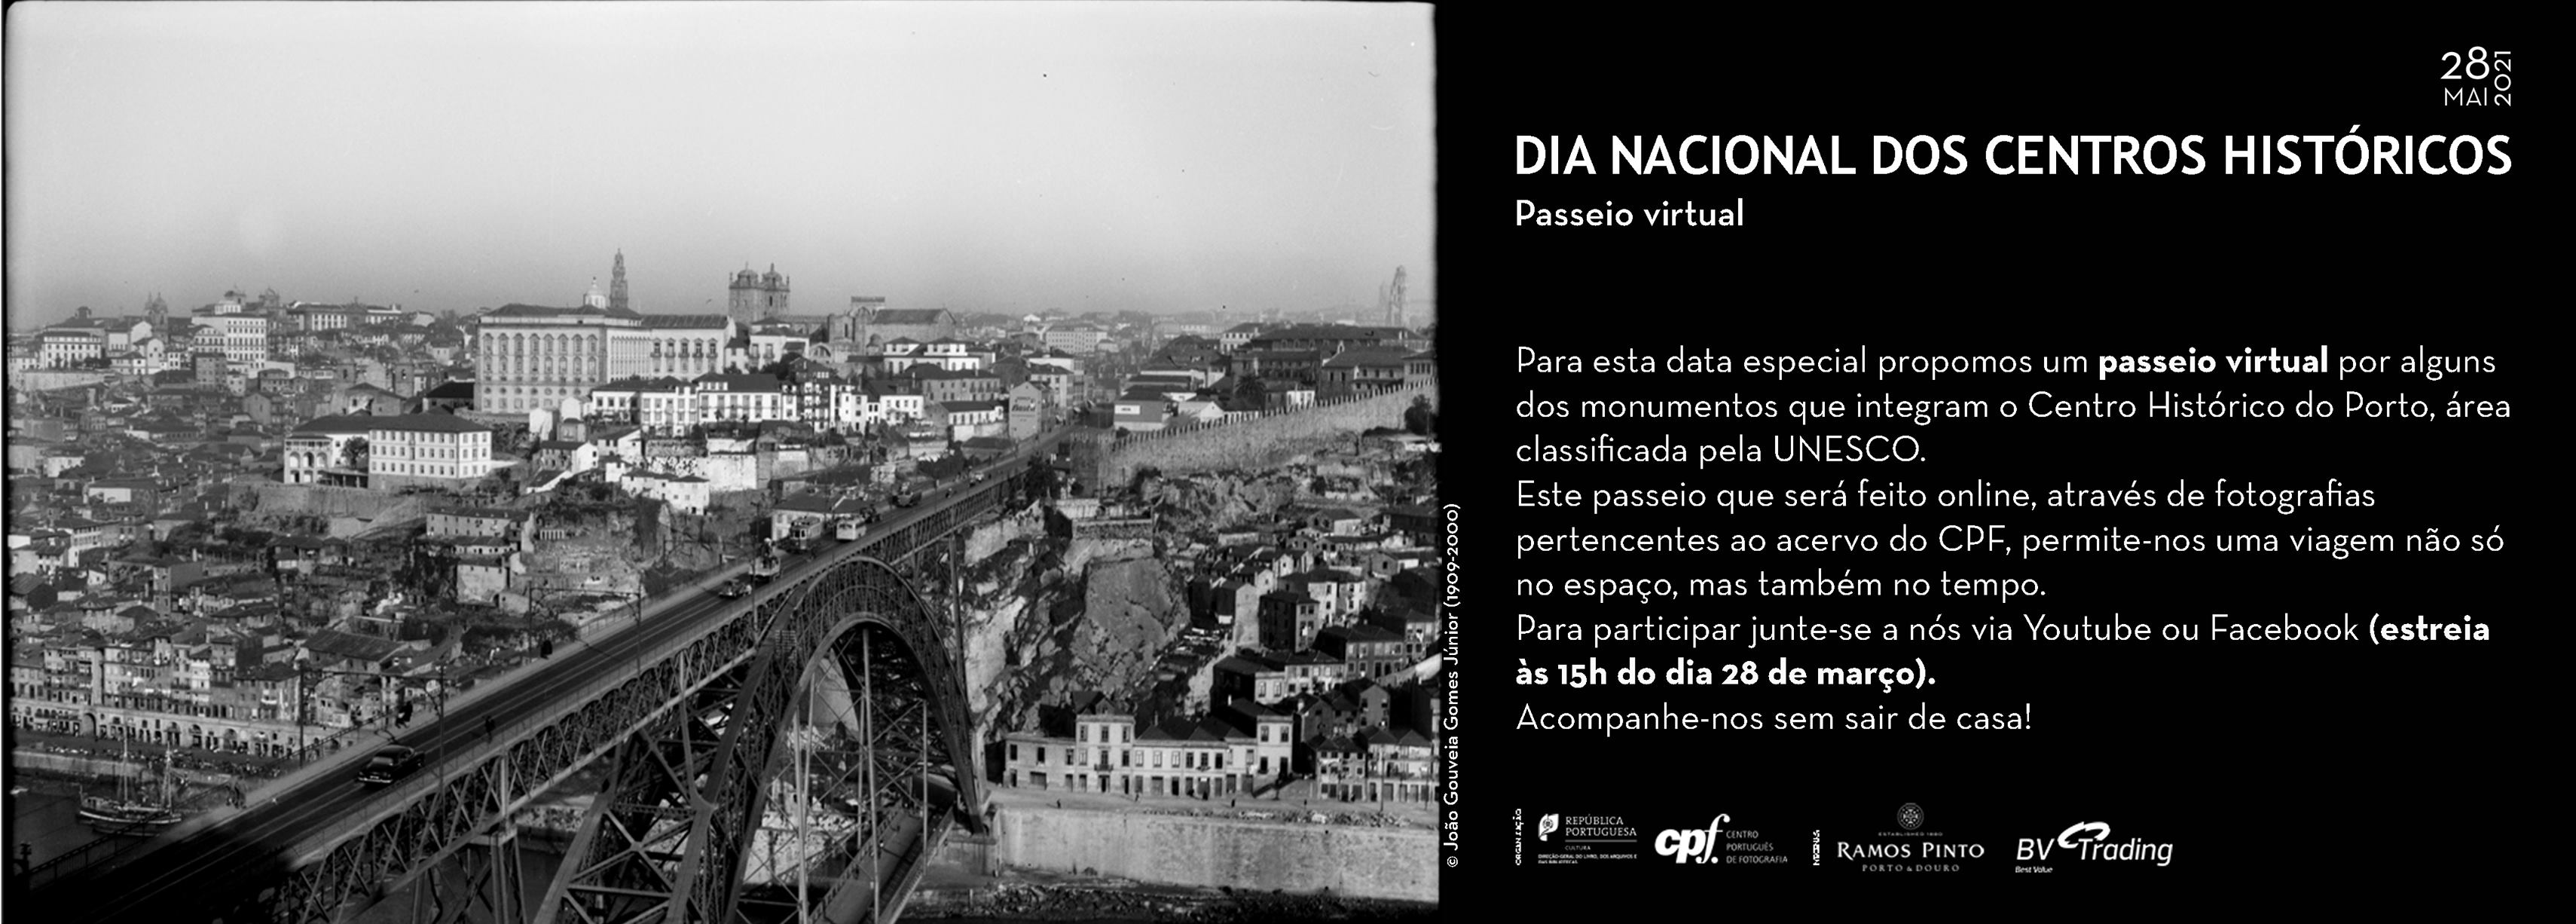 Dia Nacional dos Centros Históricos 2021_ Visita virtual promovida pelo CPF